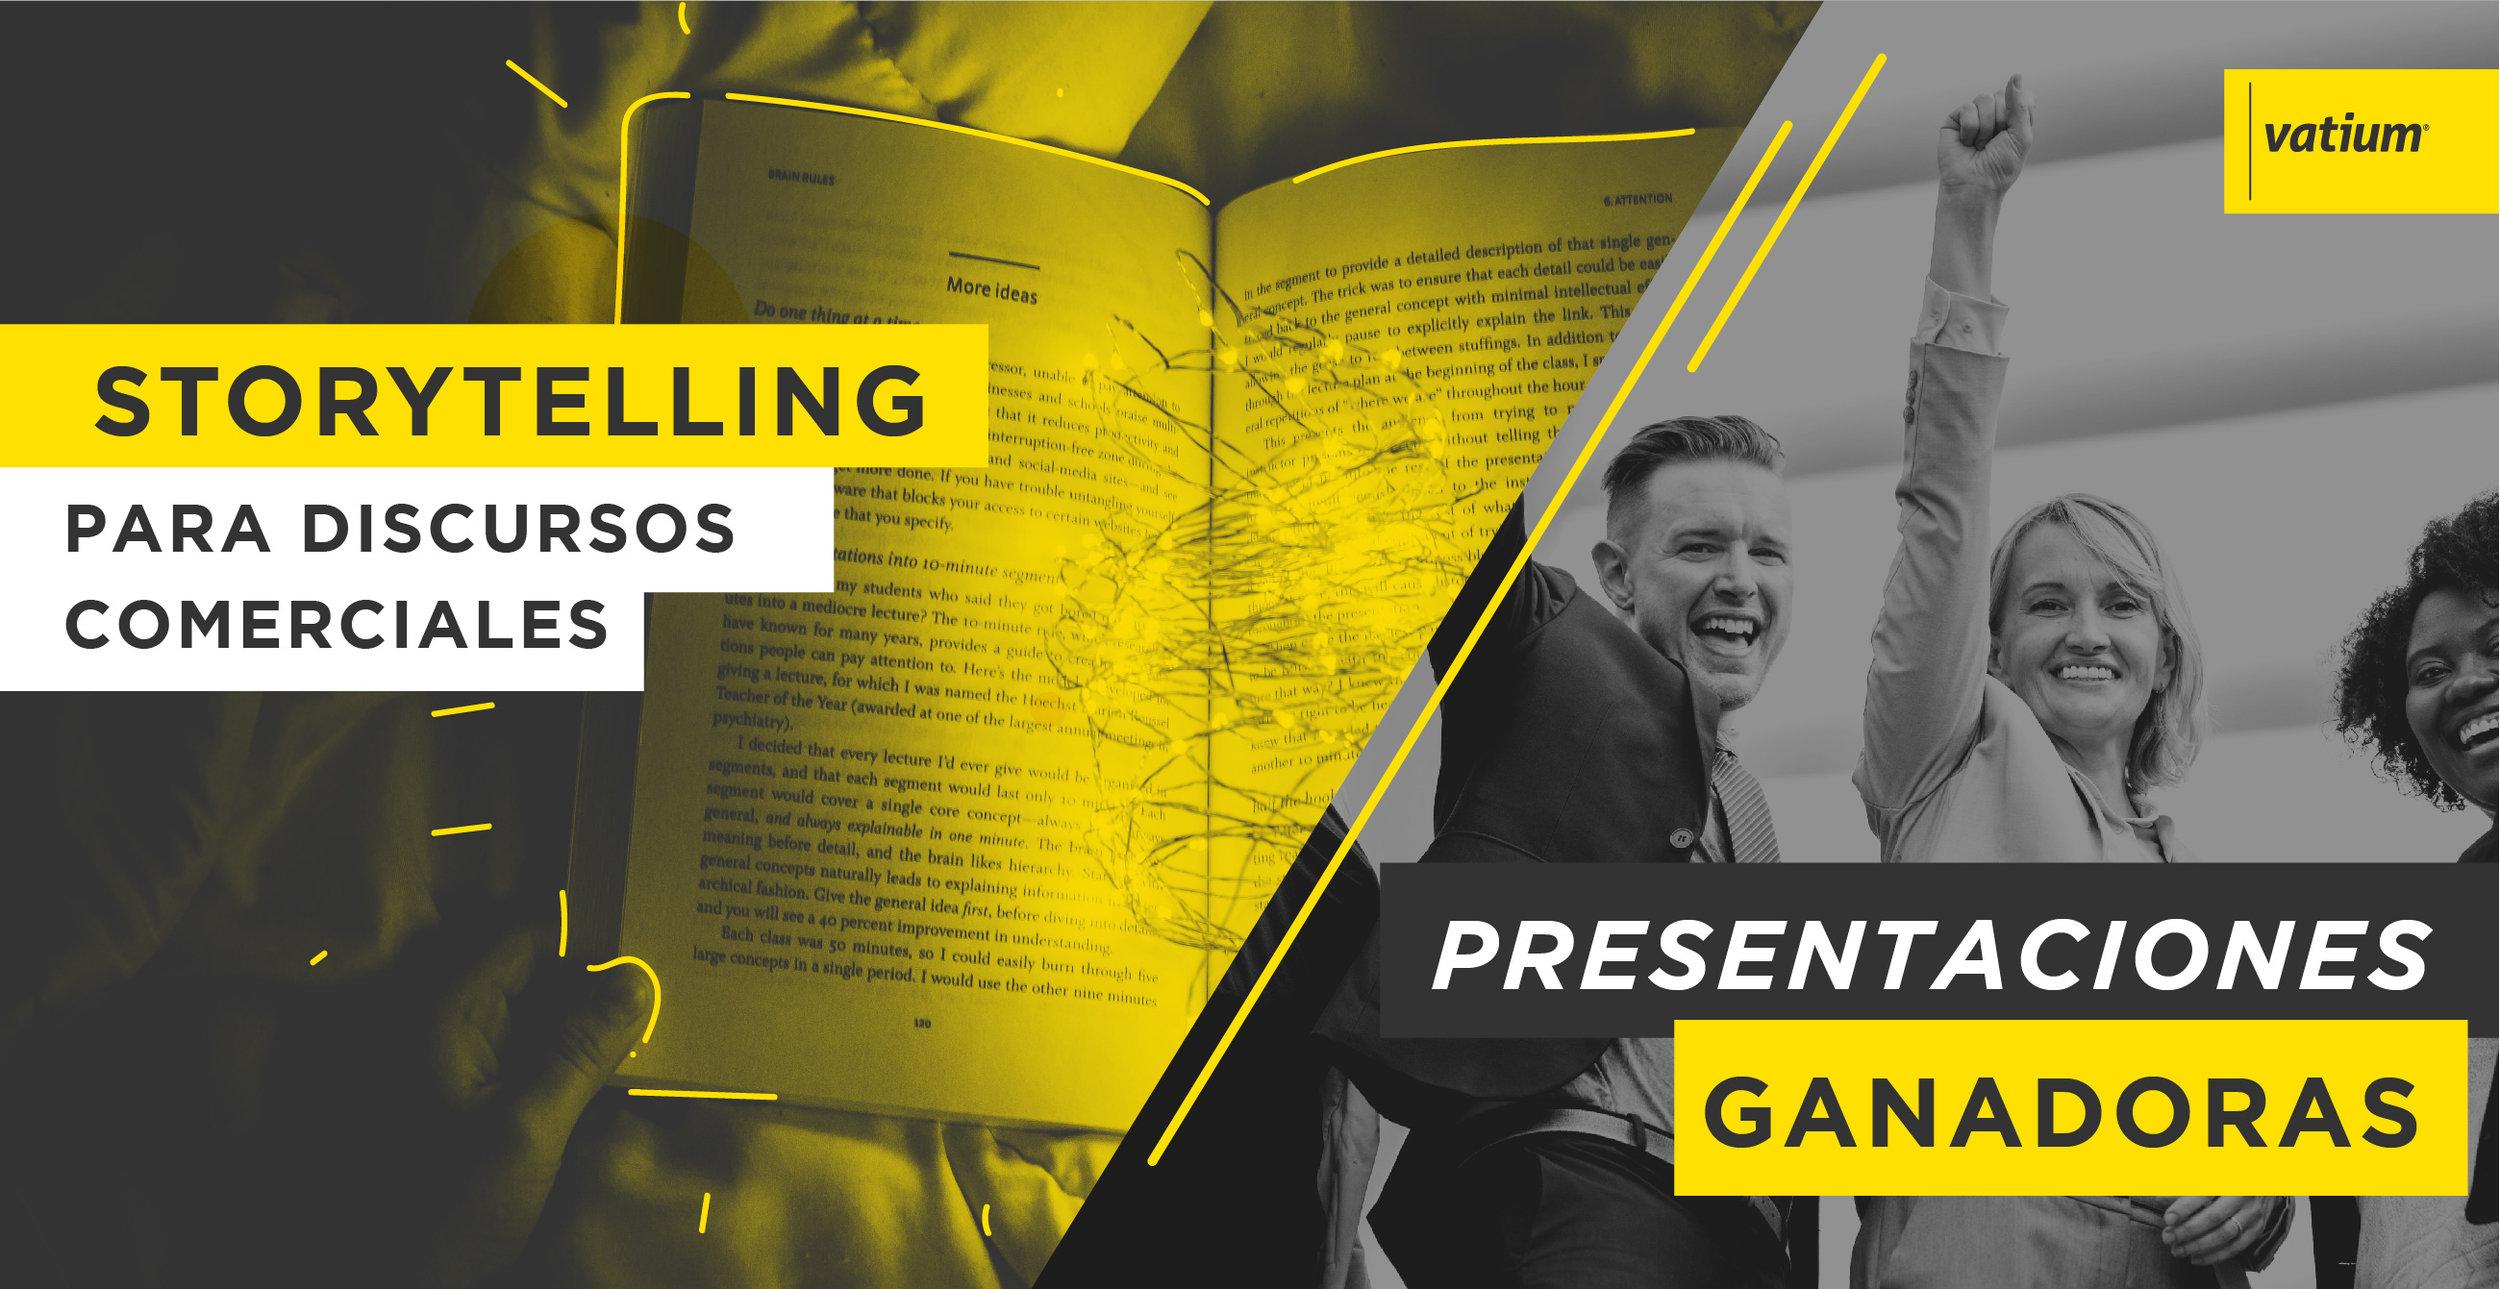 branding b2b storytelling presentaciones efectivas.jpg